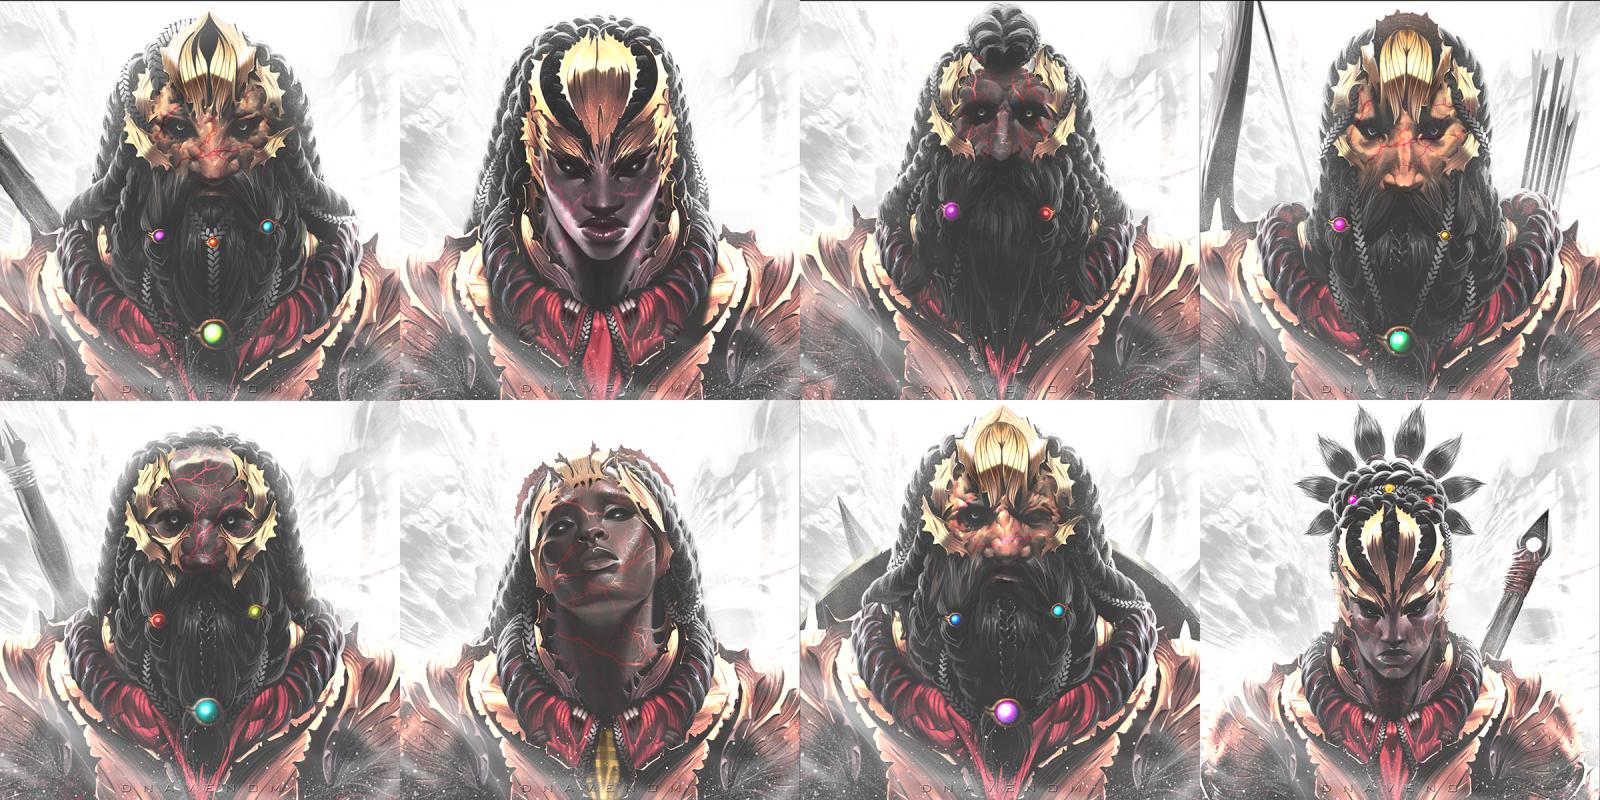 Parshendi Faces